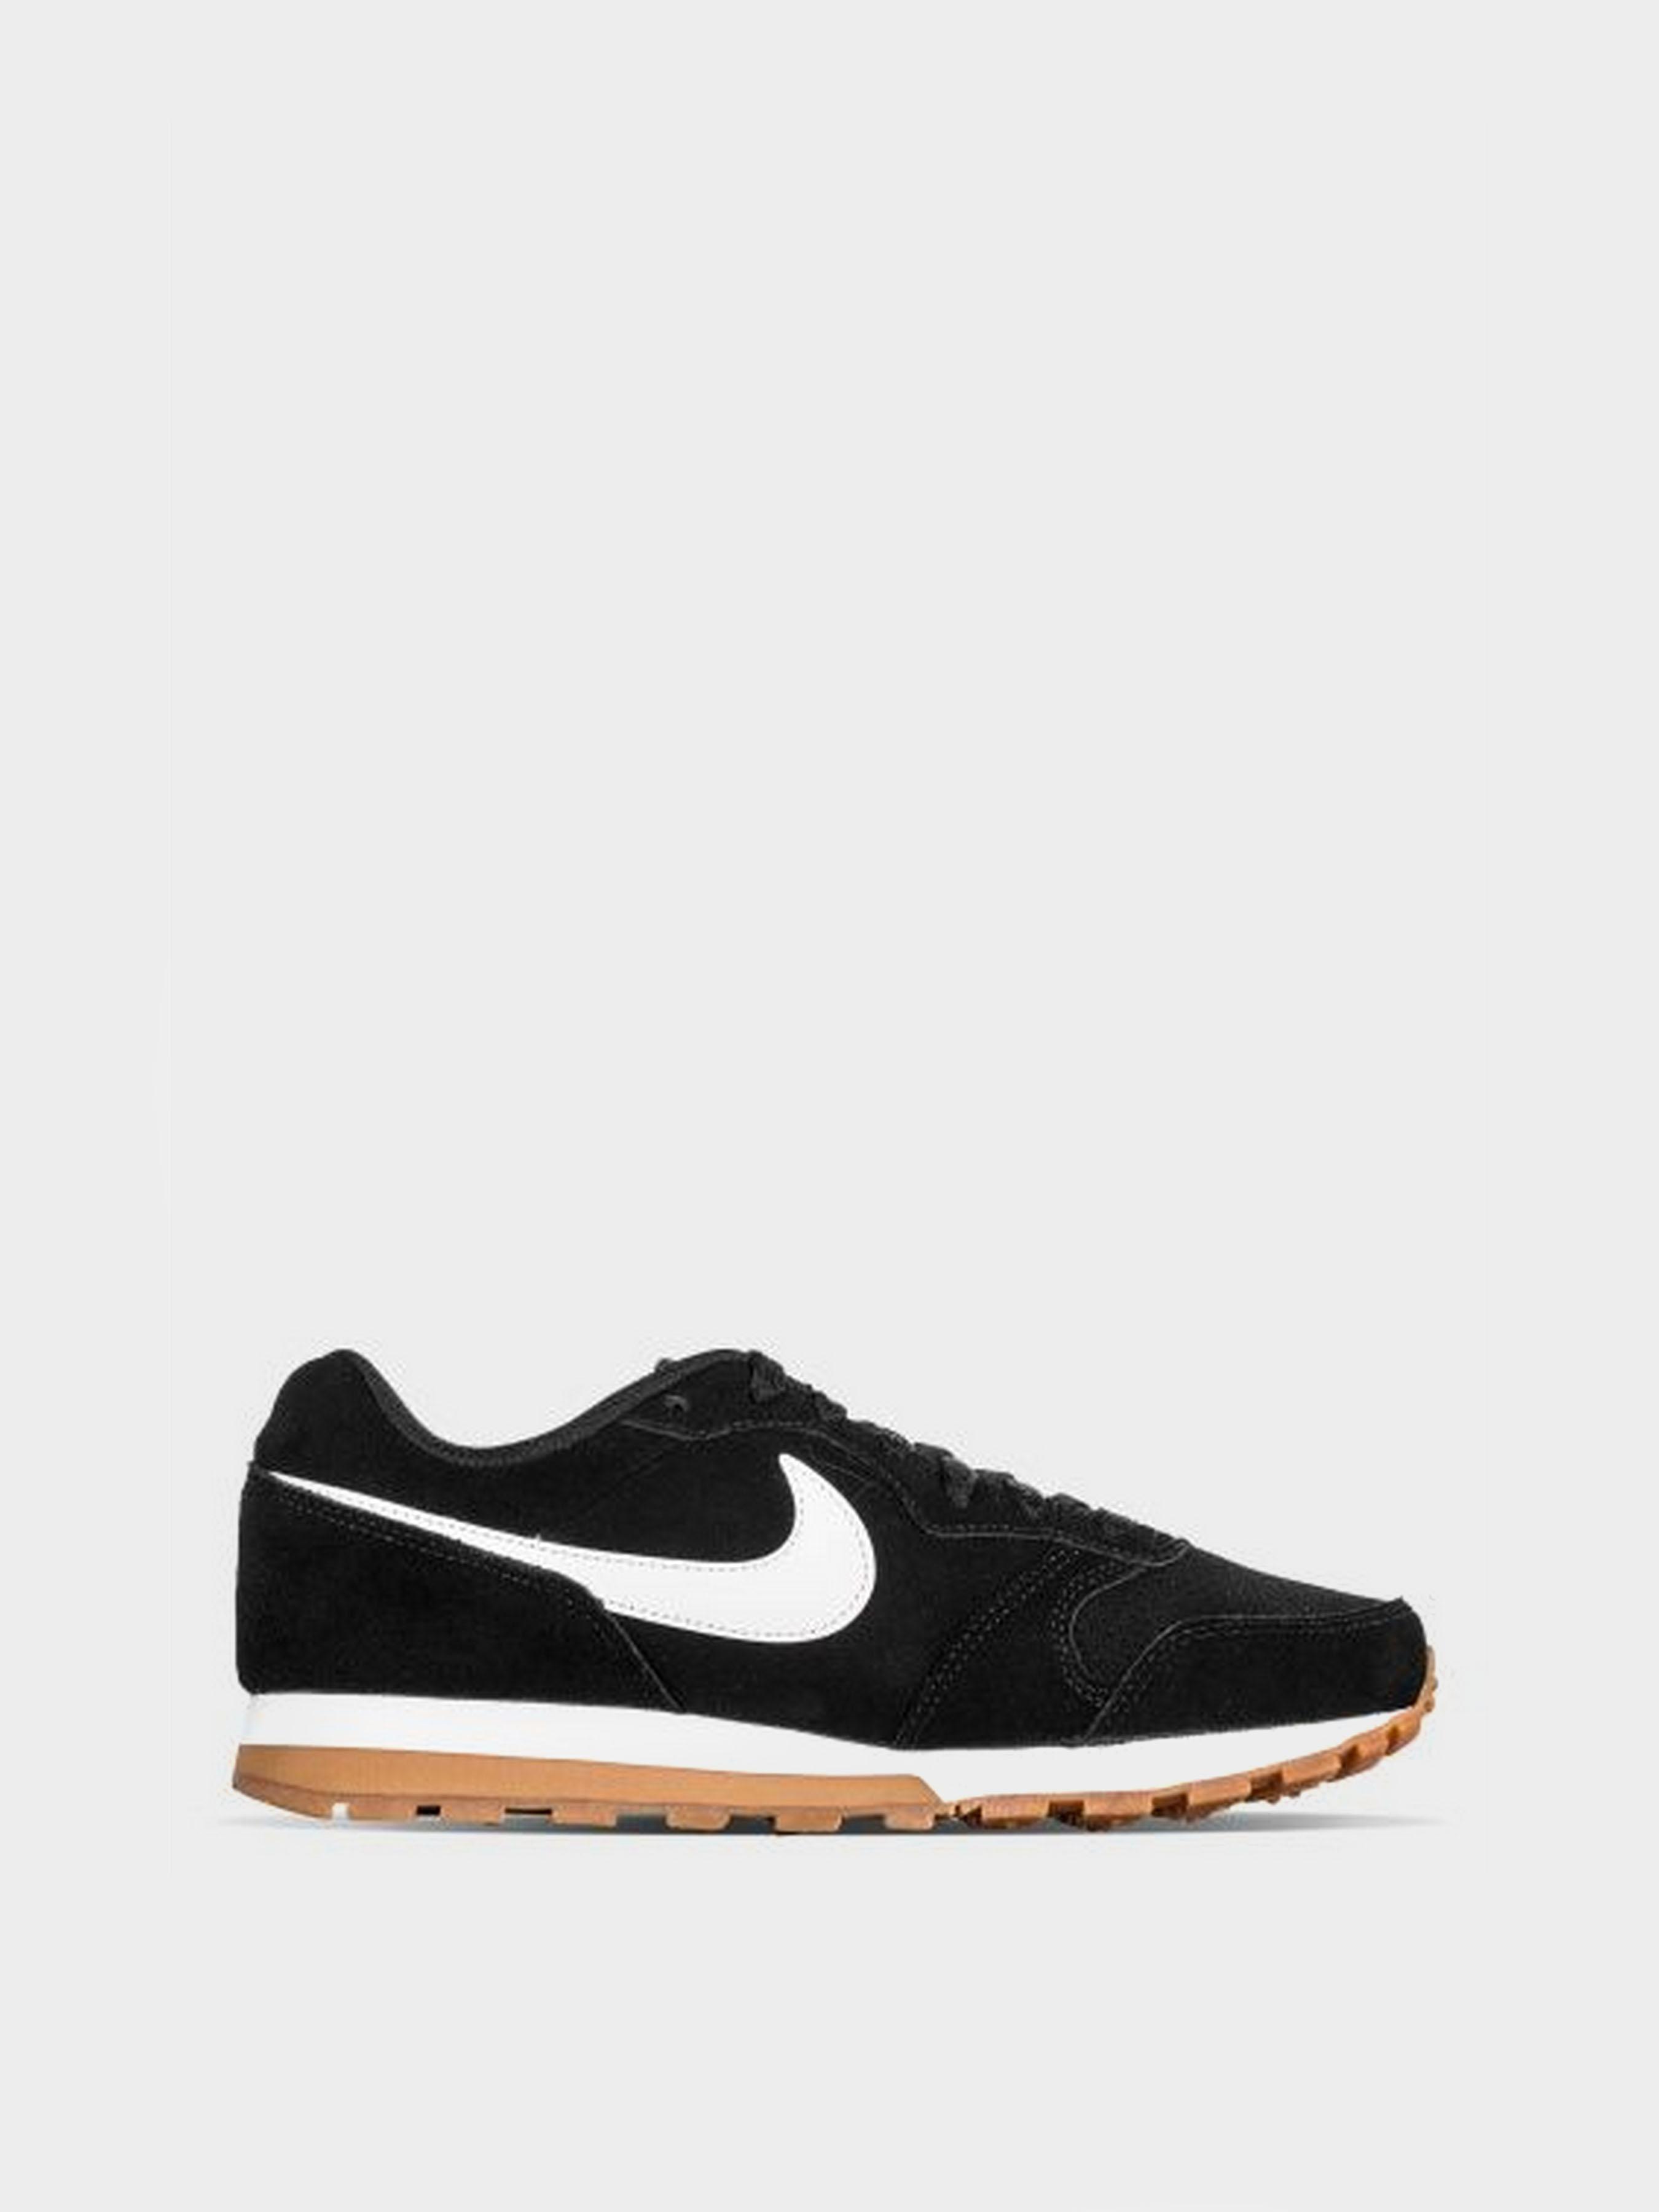 Кроссовки для мужчин NIKE MD Runner 2 Suede CE163 продажа, 2017